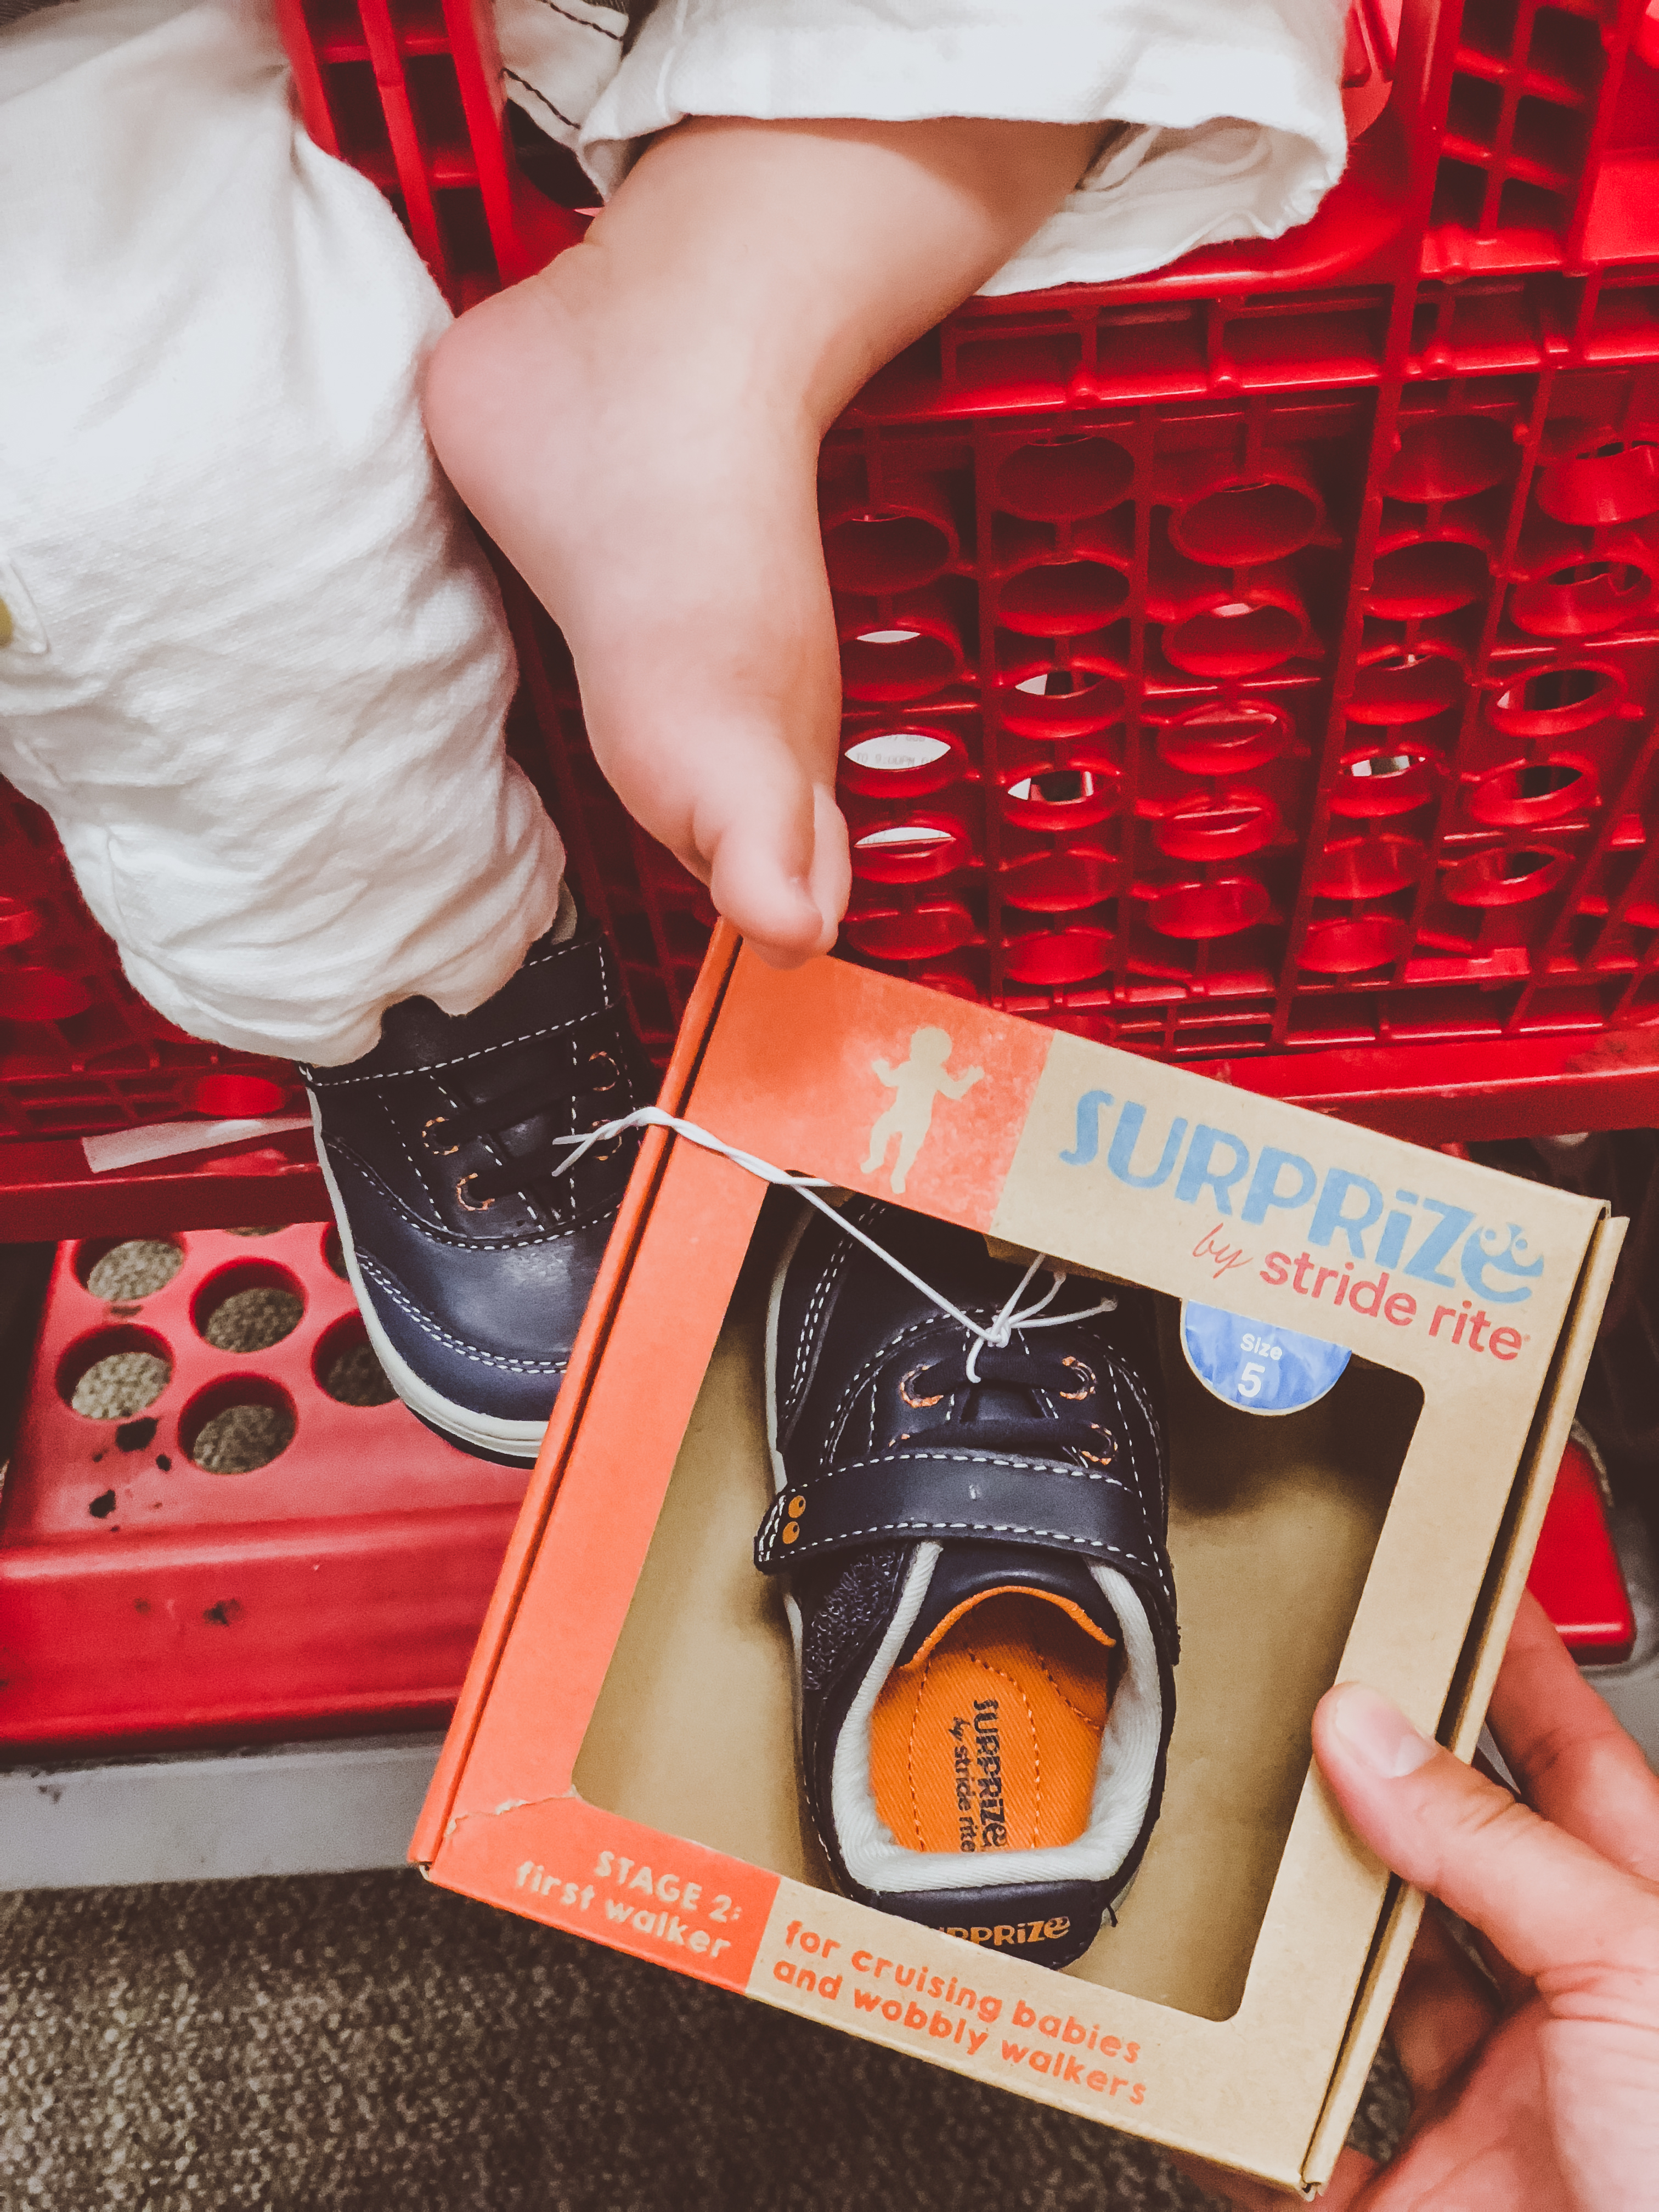 Sebi's Surprize by Stride Rite Shoes from Target | BondGirlGlam.com